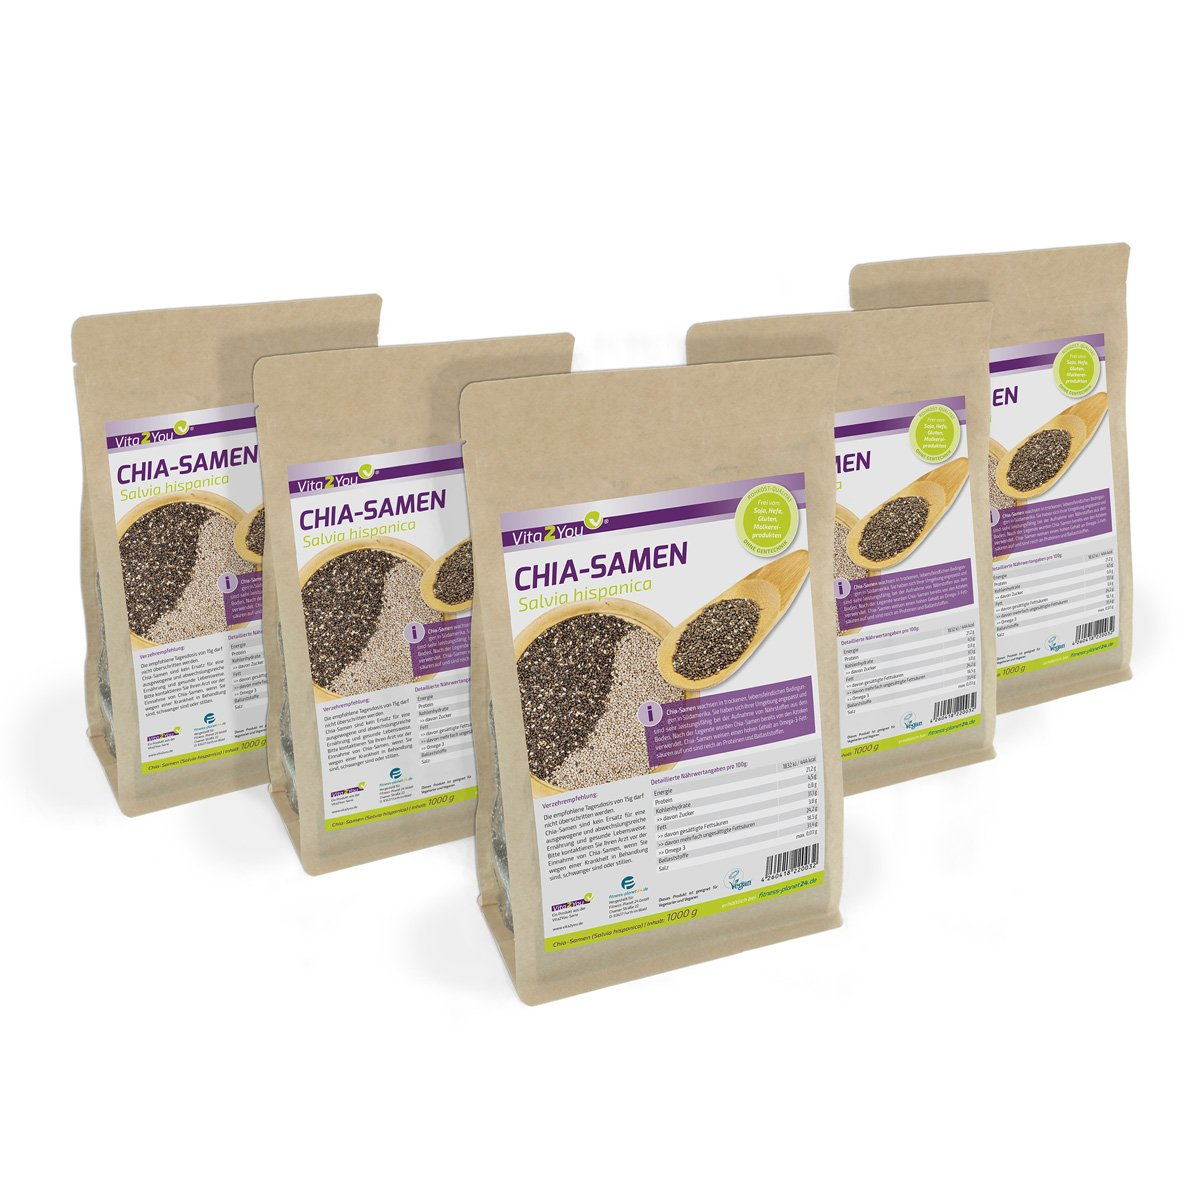 Vita2You Chia Samen - Salvia Hispanica - 5 x 1kg Zippbeutel - 5er Pack (5000g) product image